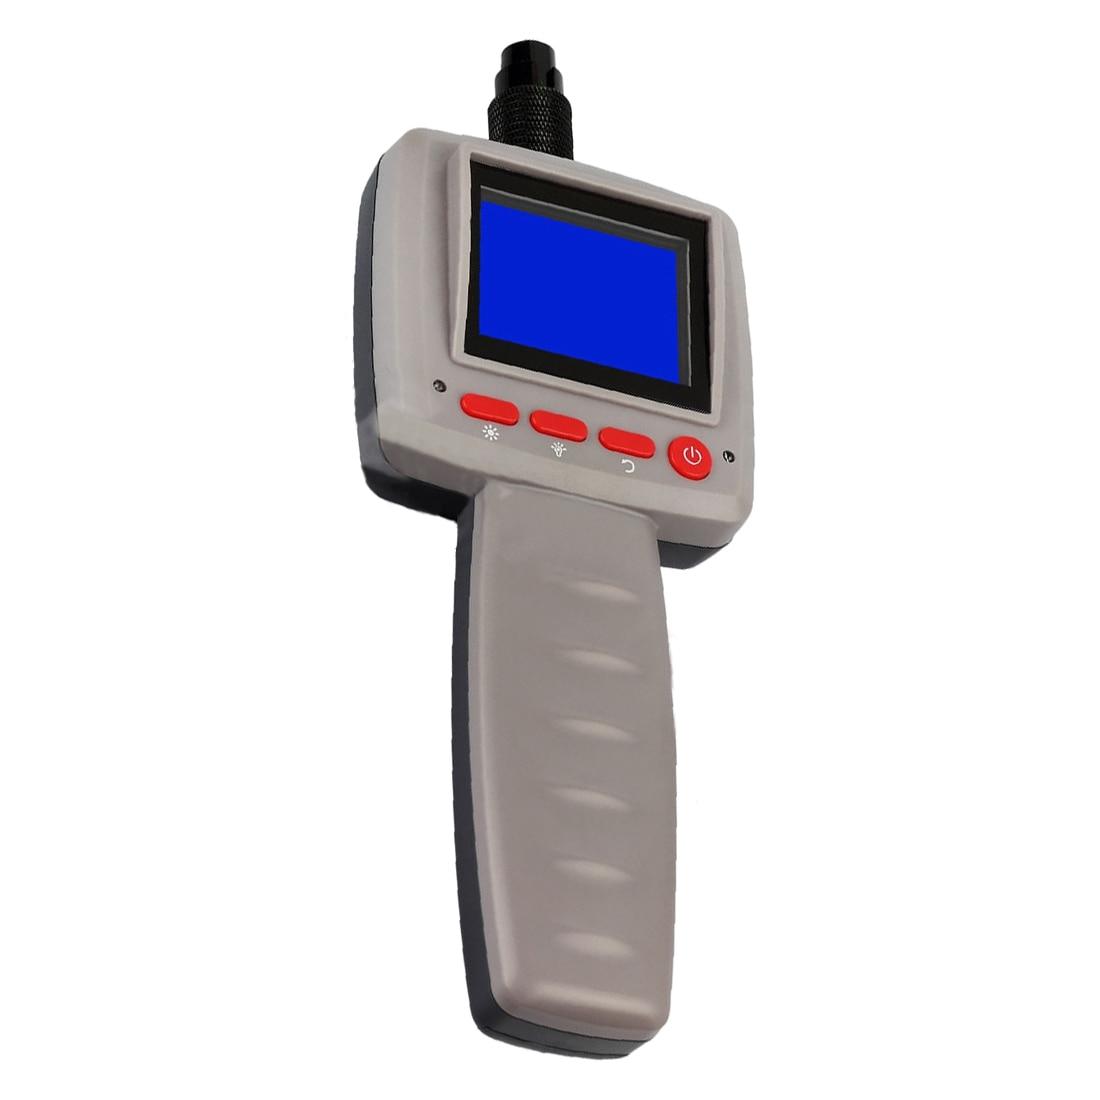 MOOL 2.4 Video LCD Inspection Endoscope Borescope 1m Pipe 10mm Camera Snake Scope explorer 8807al inspection camera boroscope 1m cable 4 5 mm 3 5 lcd recordable wireless inspection camera video borescope